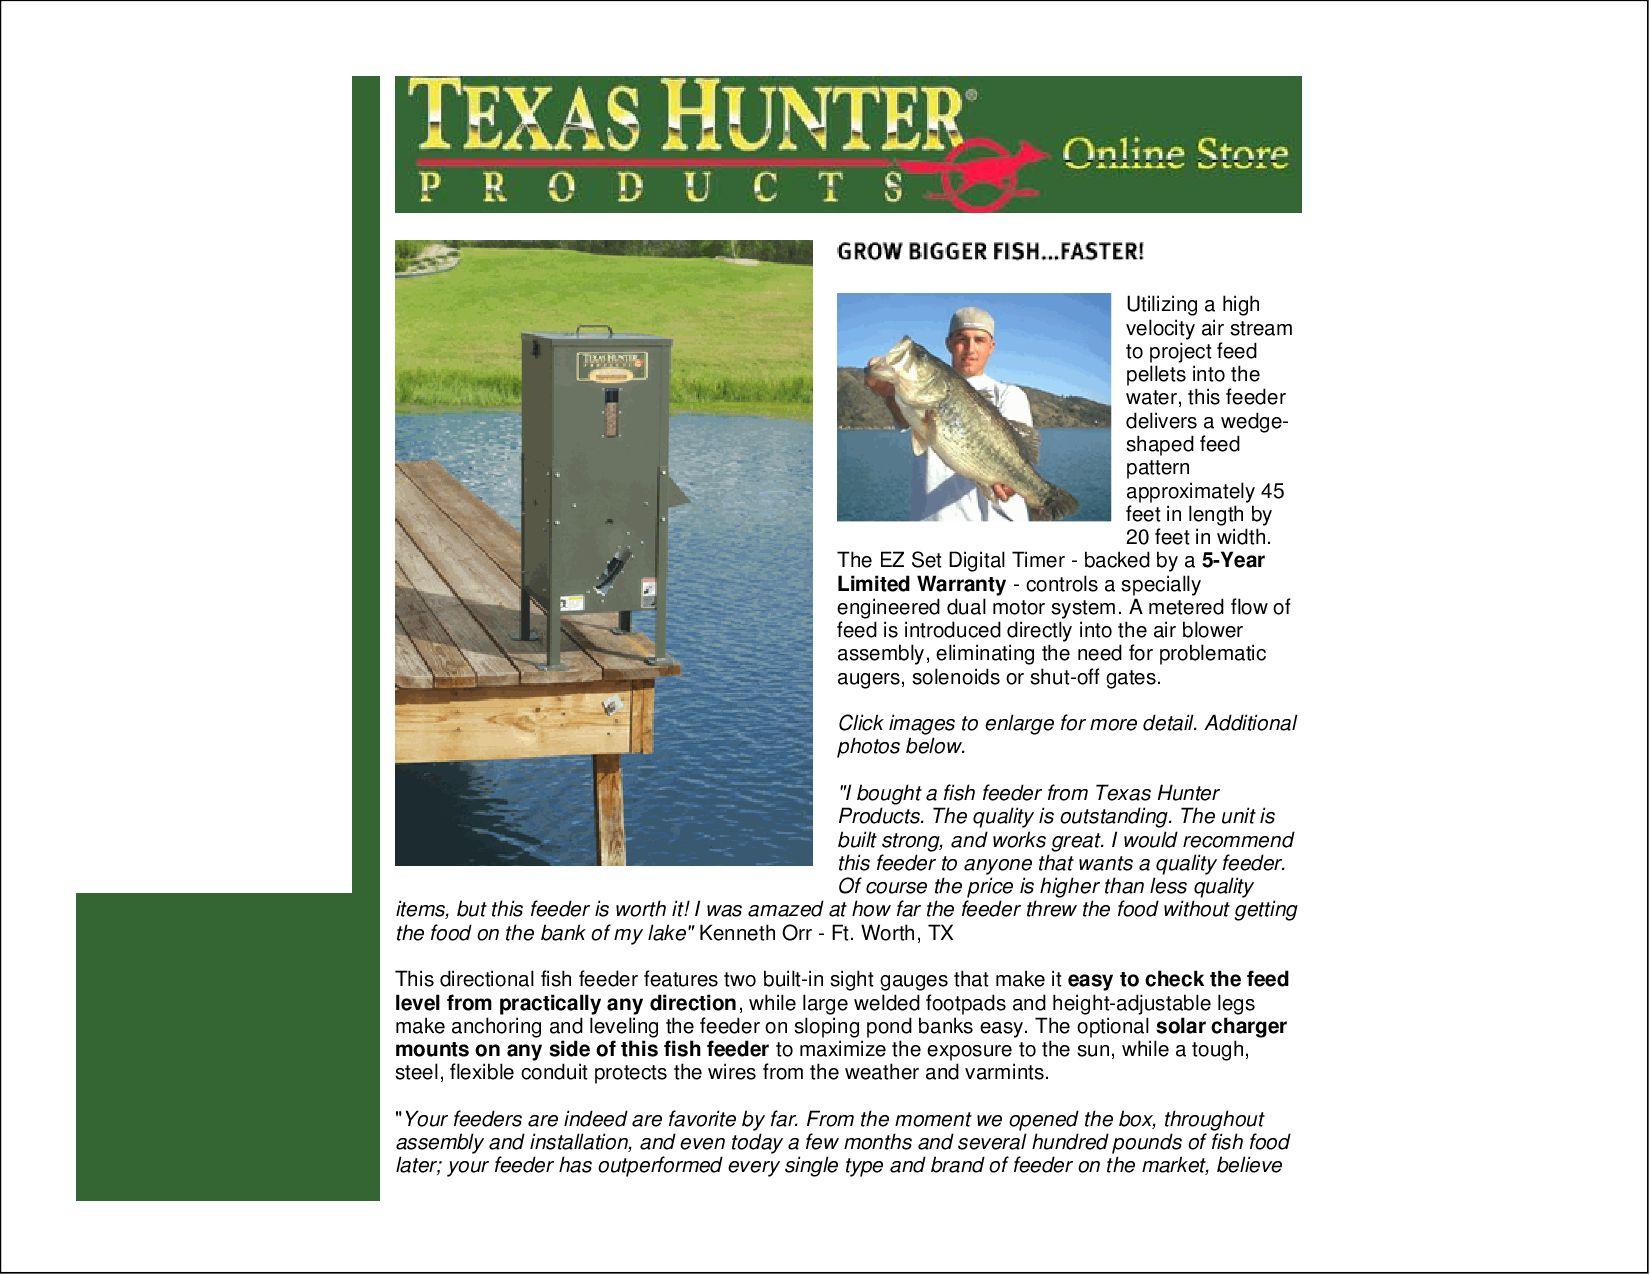 timer aquarium directional fish intelli feed feeder lifegard aquatics vacation pin